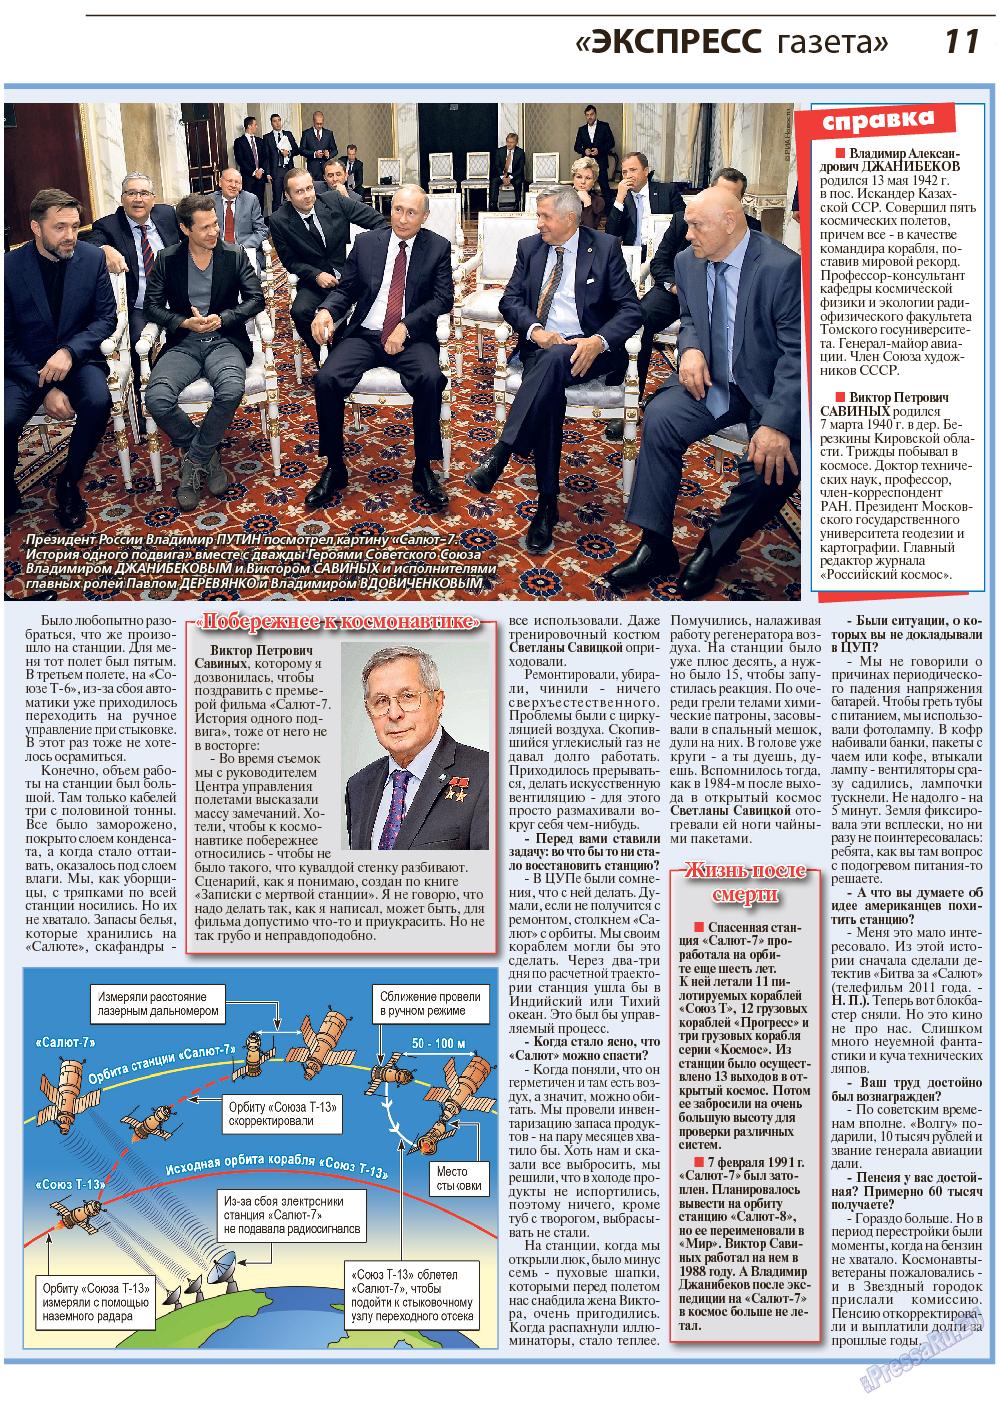 Экспресс газета (газета). 2017 год, номер 11, стр. 11